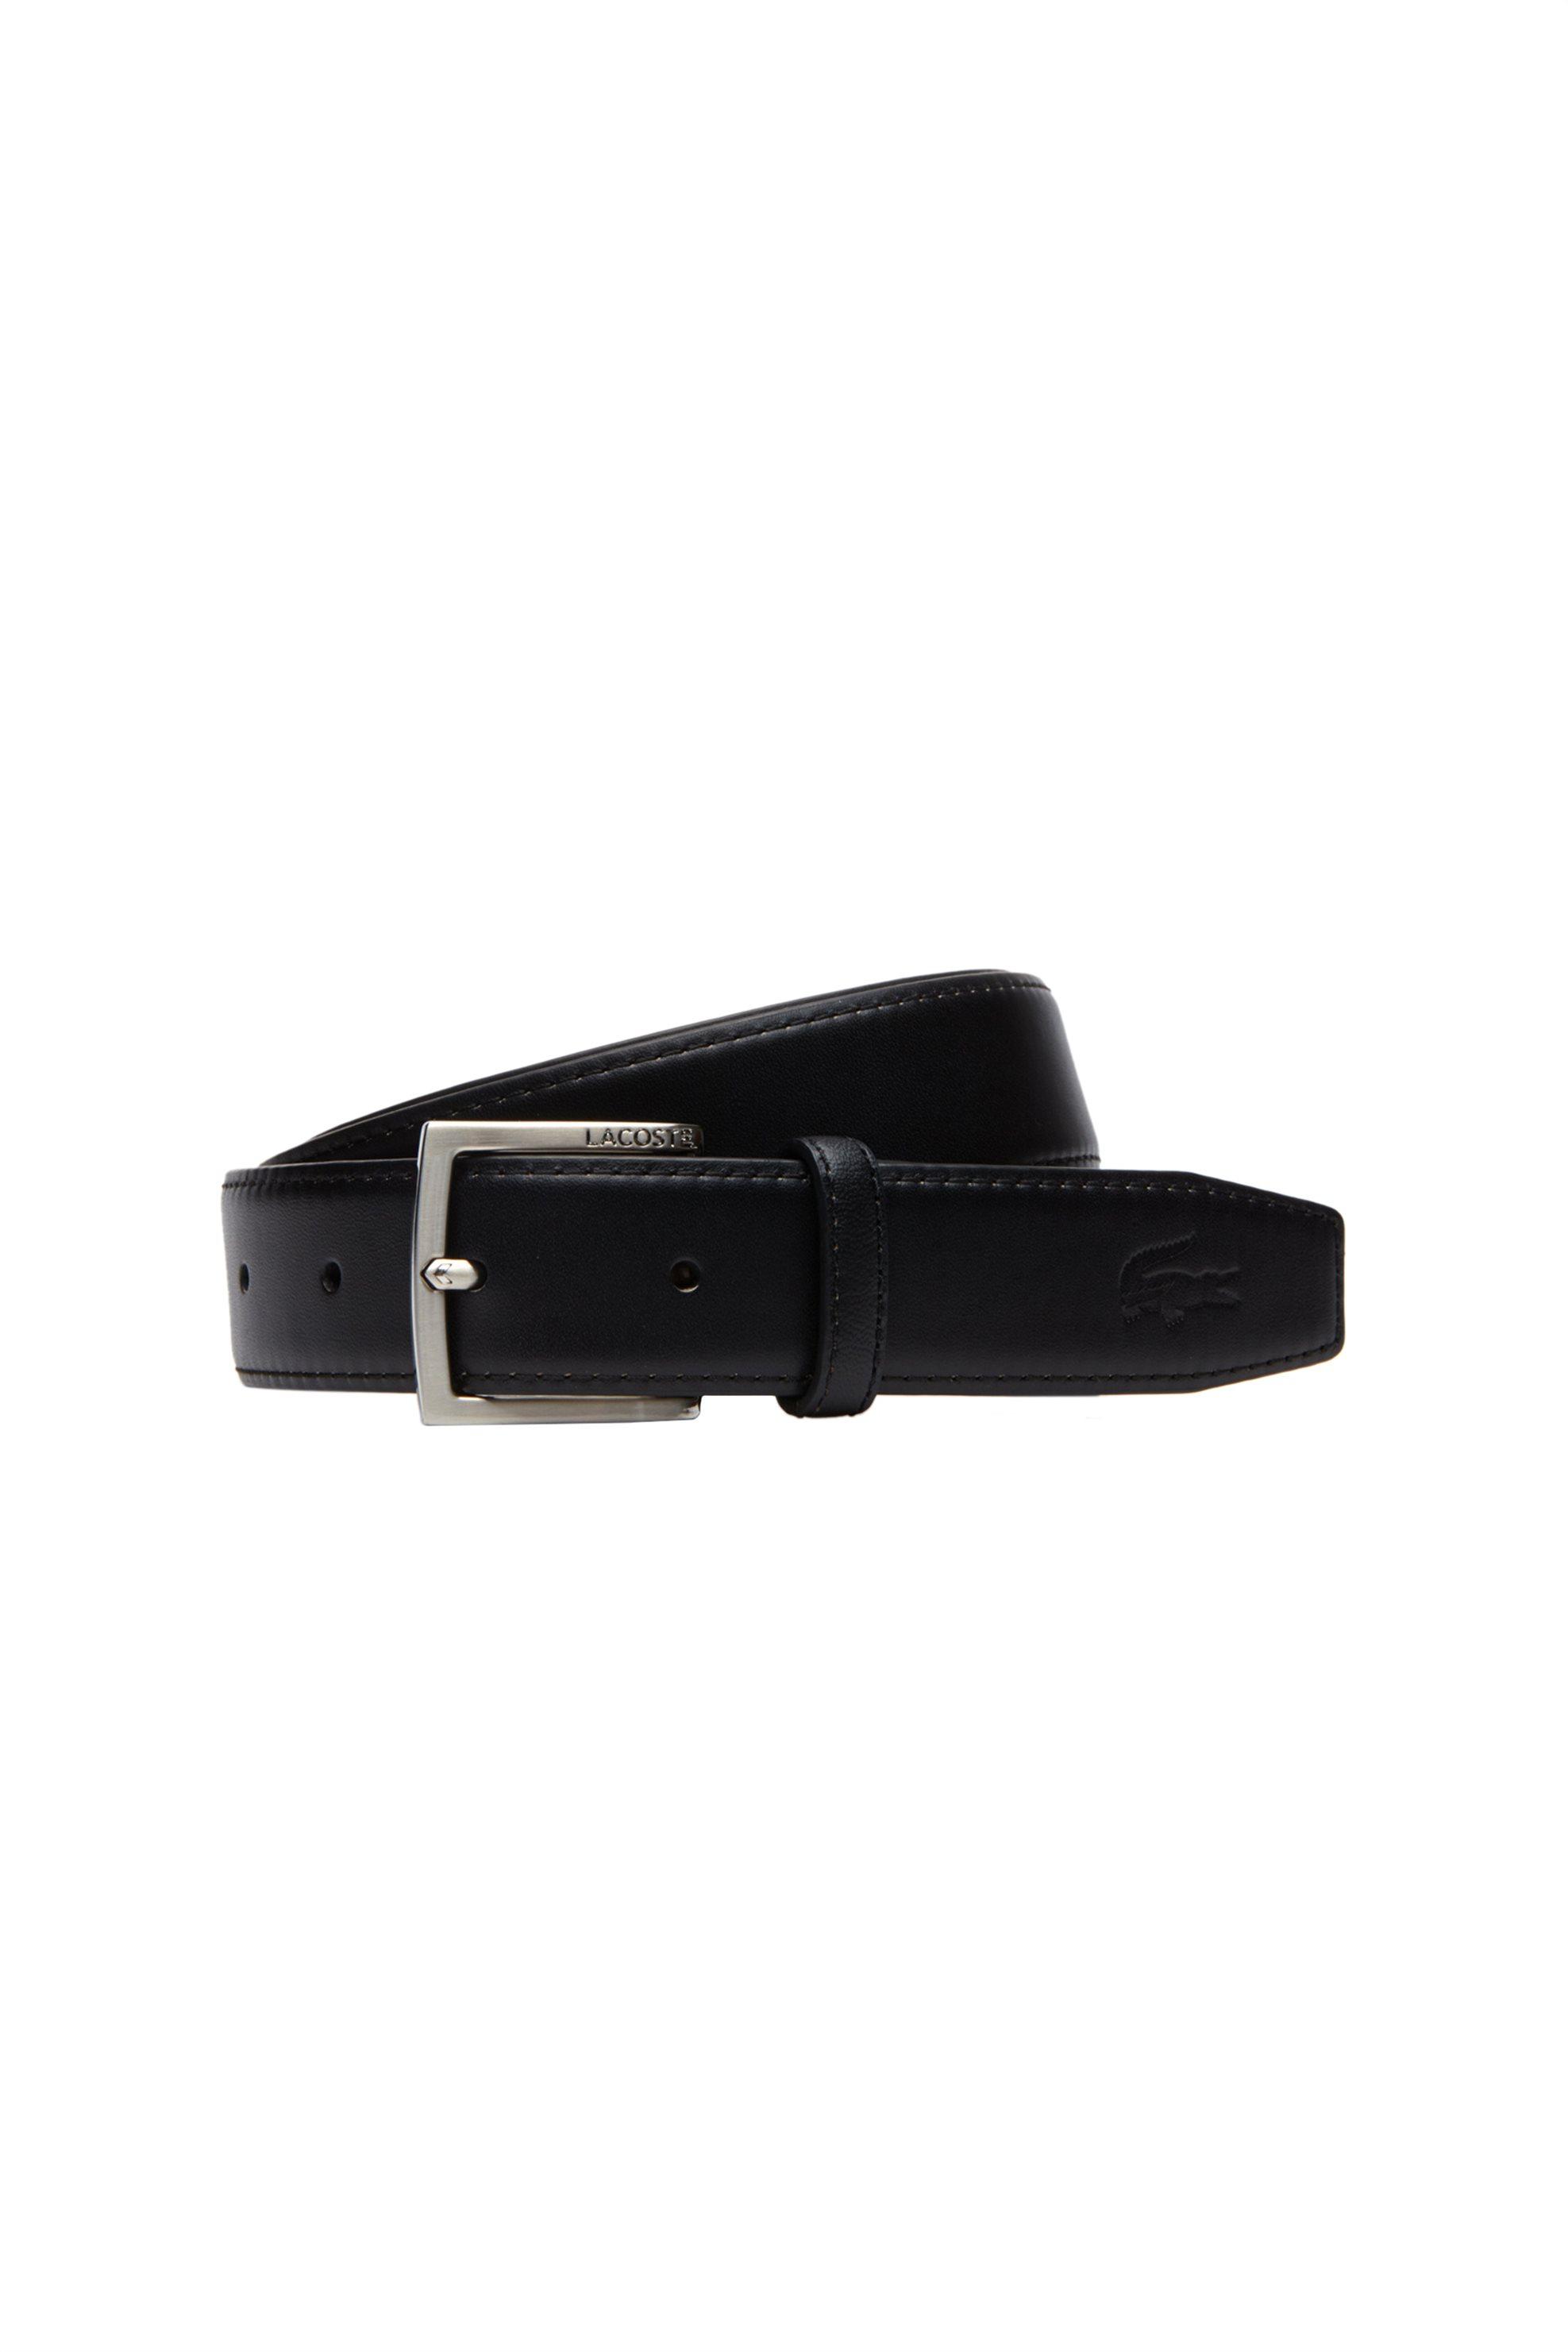 Lacosteανδρική ζώνη Engraved Tongue Buckle Leather Belt - RC1694 - Μαύρο ανδρασ   αξεσουαρ   ζώνες